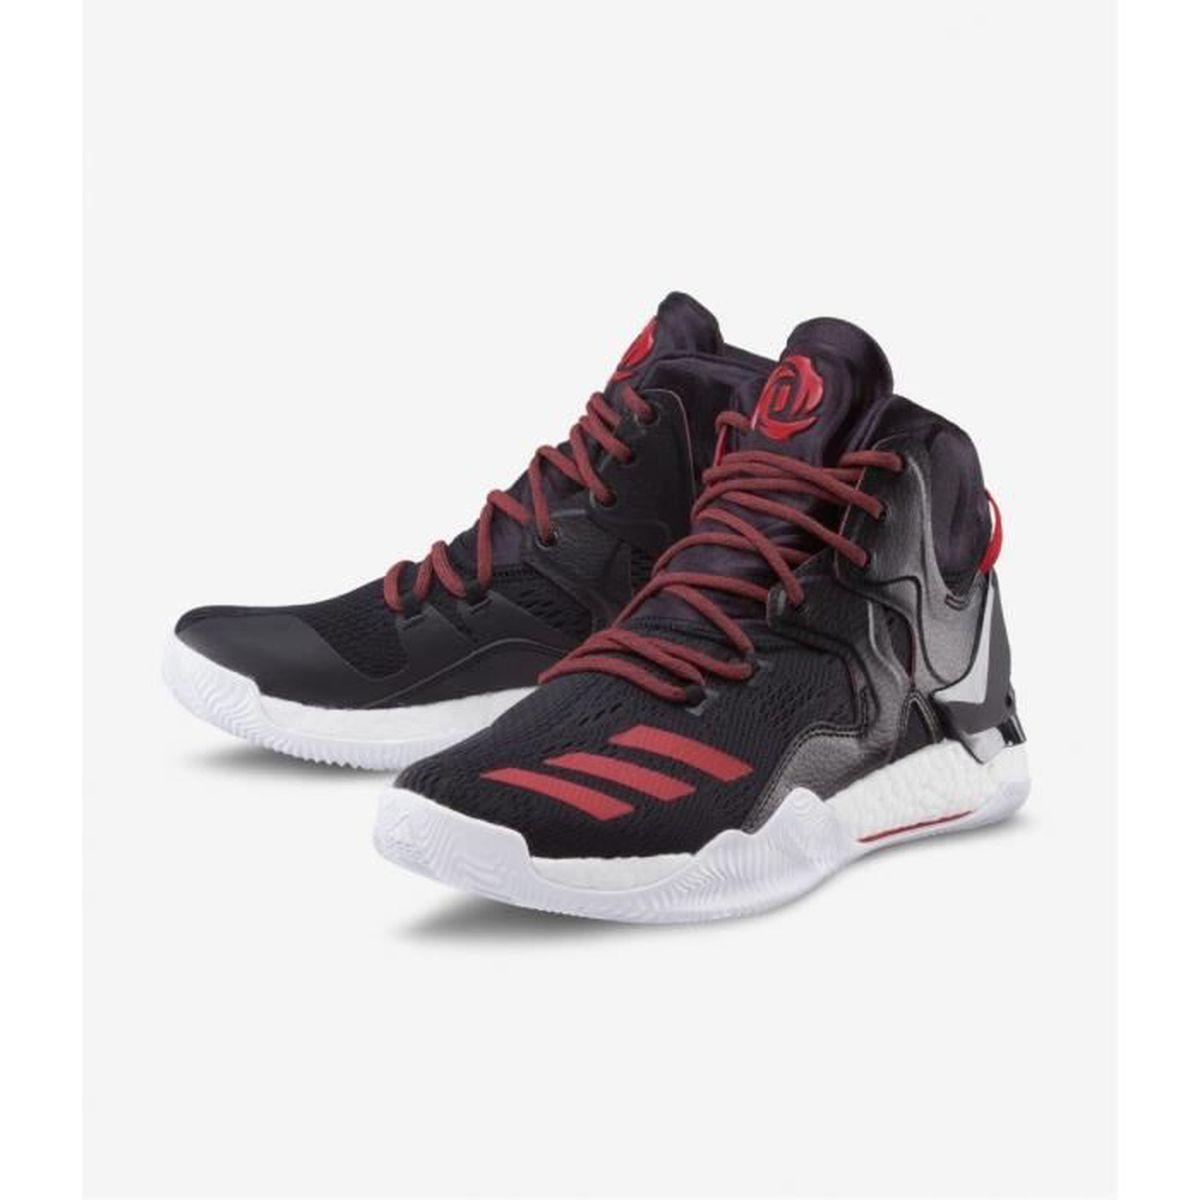 Chaussures Rose de basketball adidas Performance D Rose Chaussures 7 Noir ea7e41